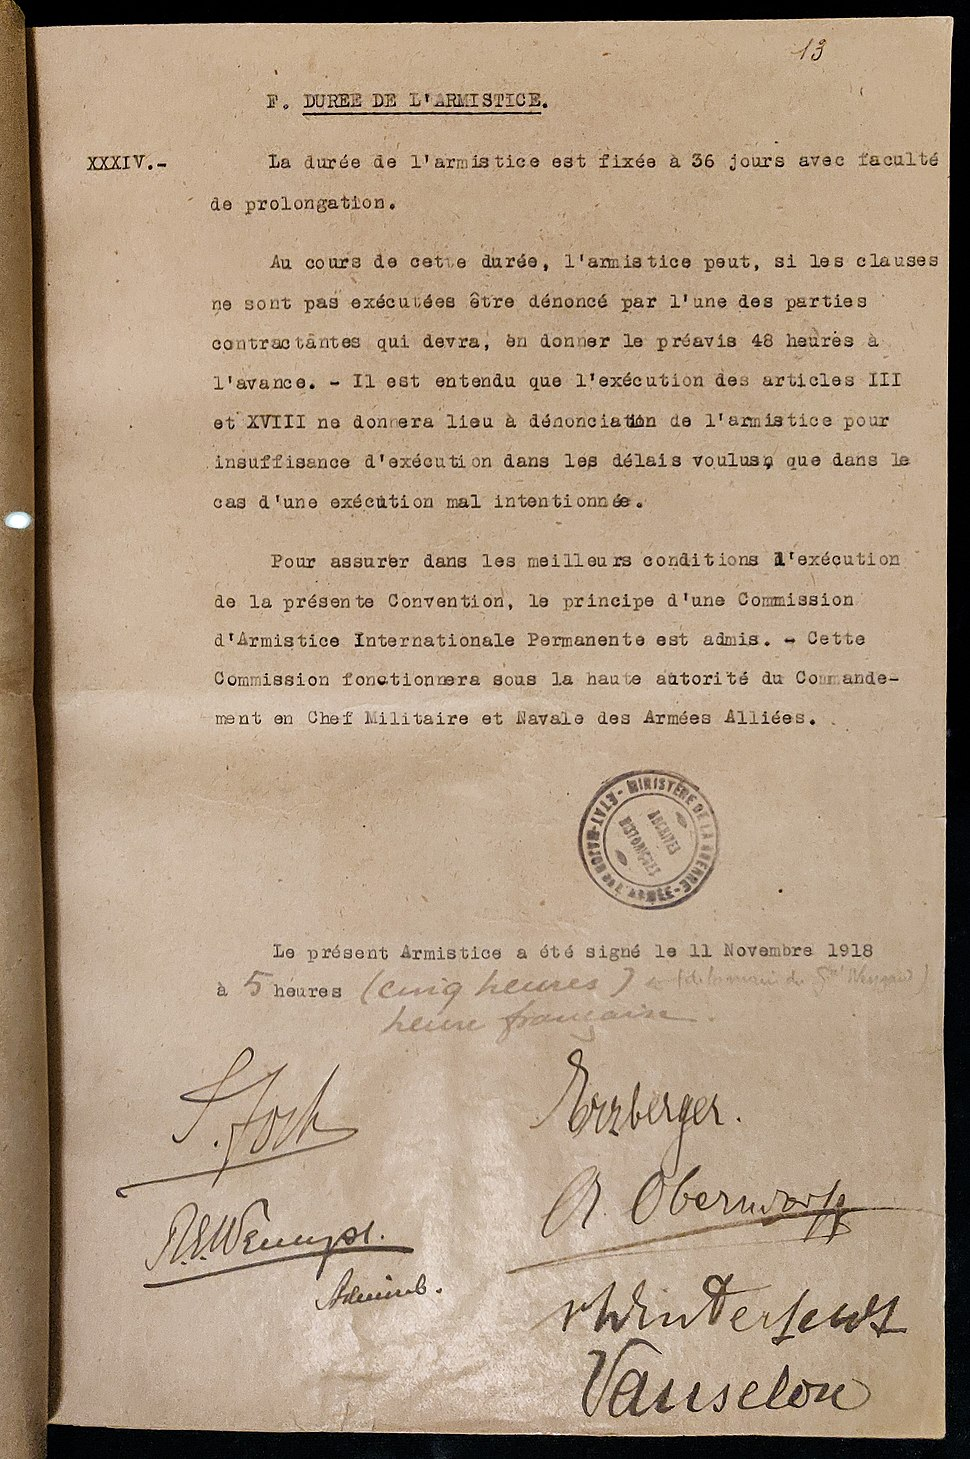 Armistice 18 novembre 1918